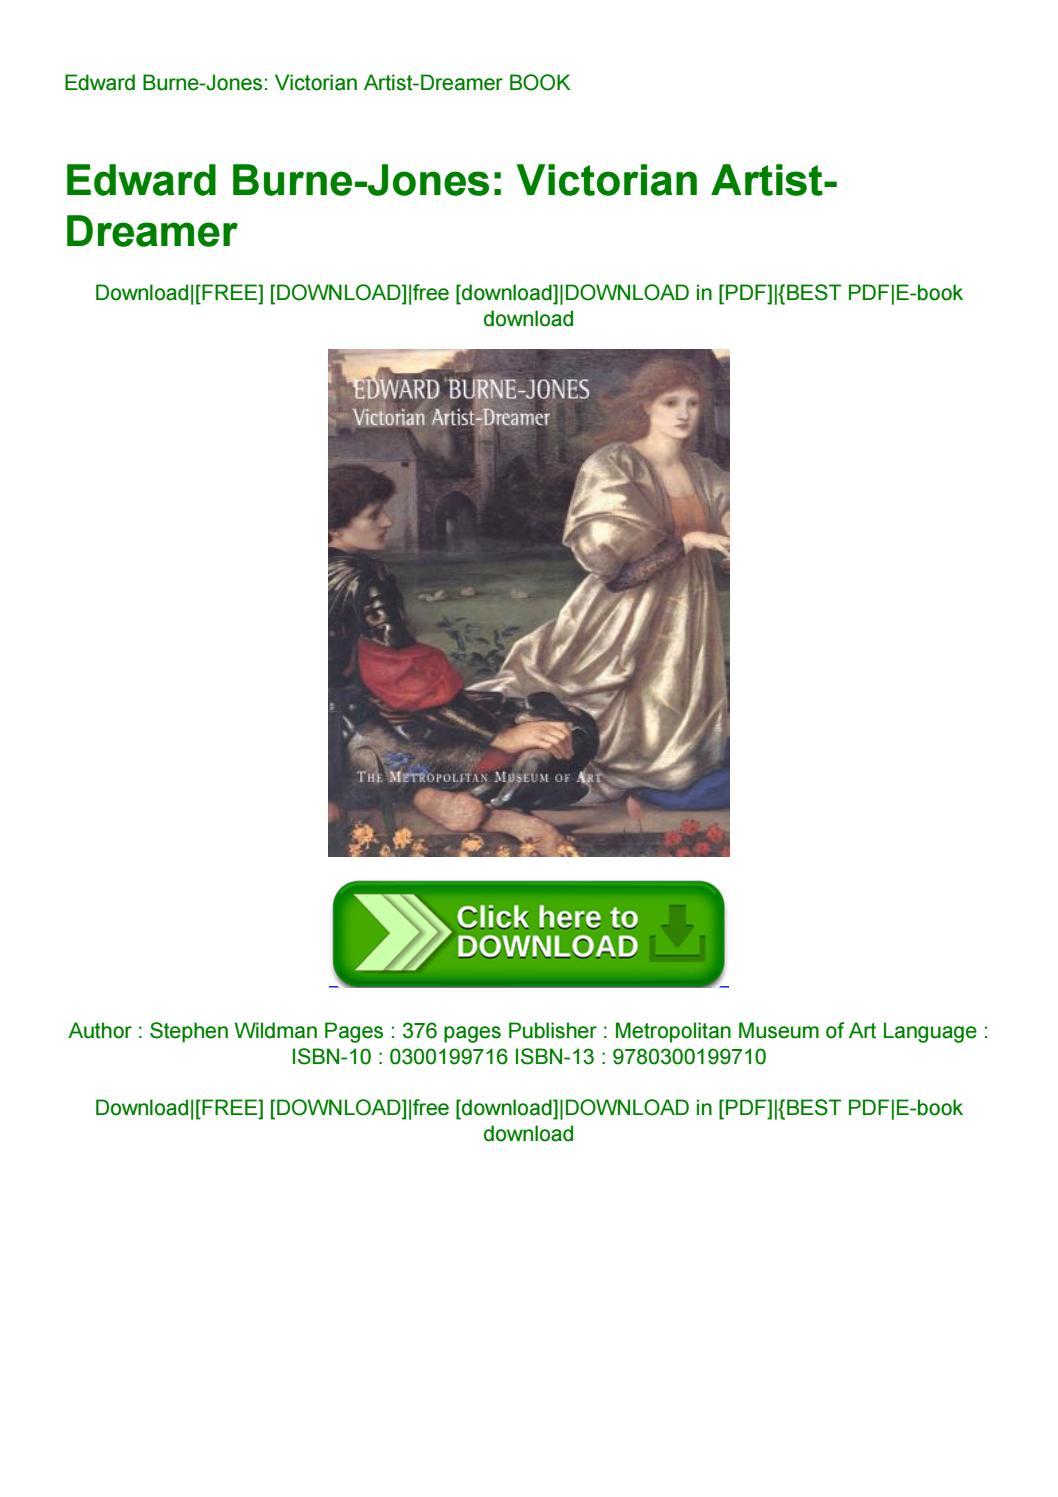 Victorian Artist-Dreamer Edward Burne-Jones